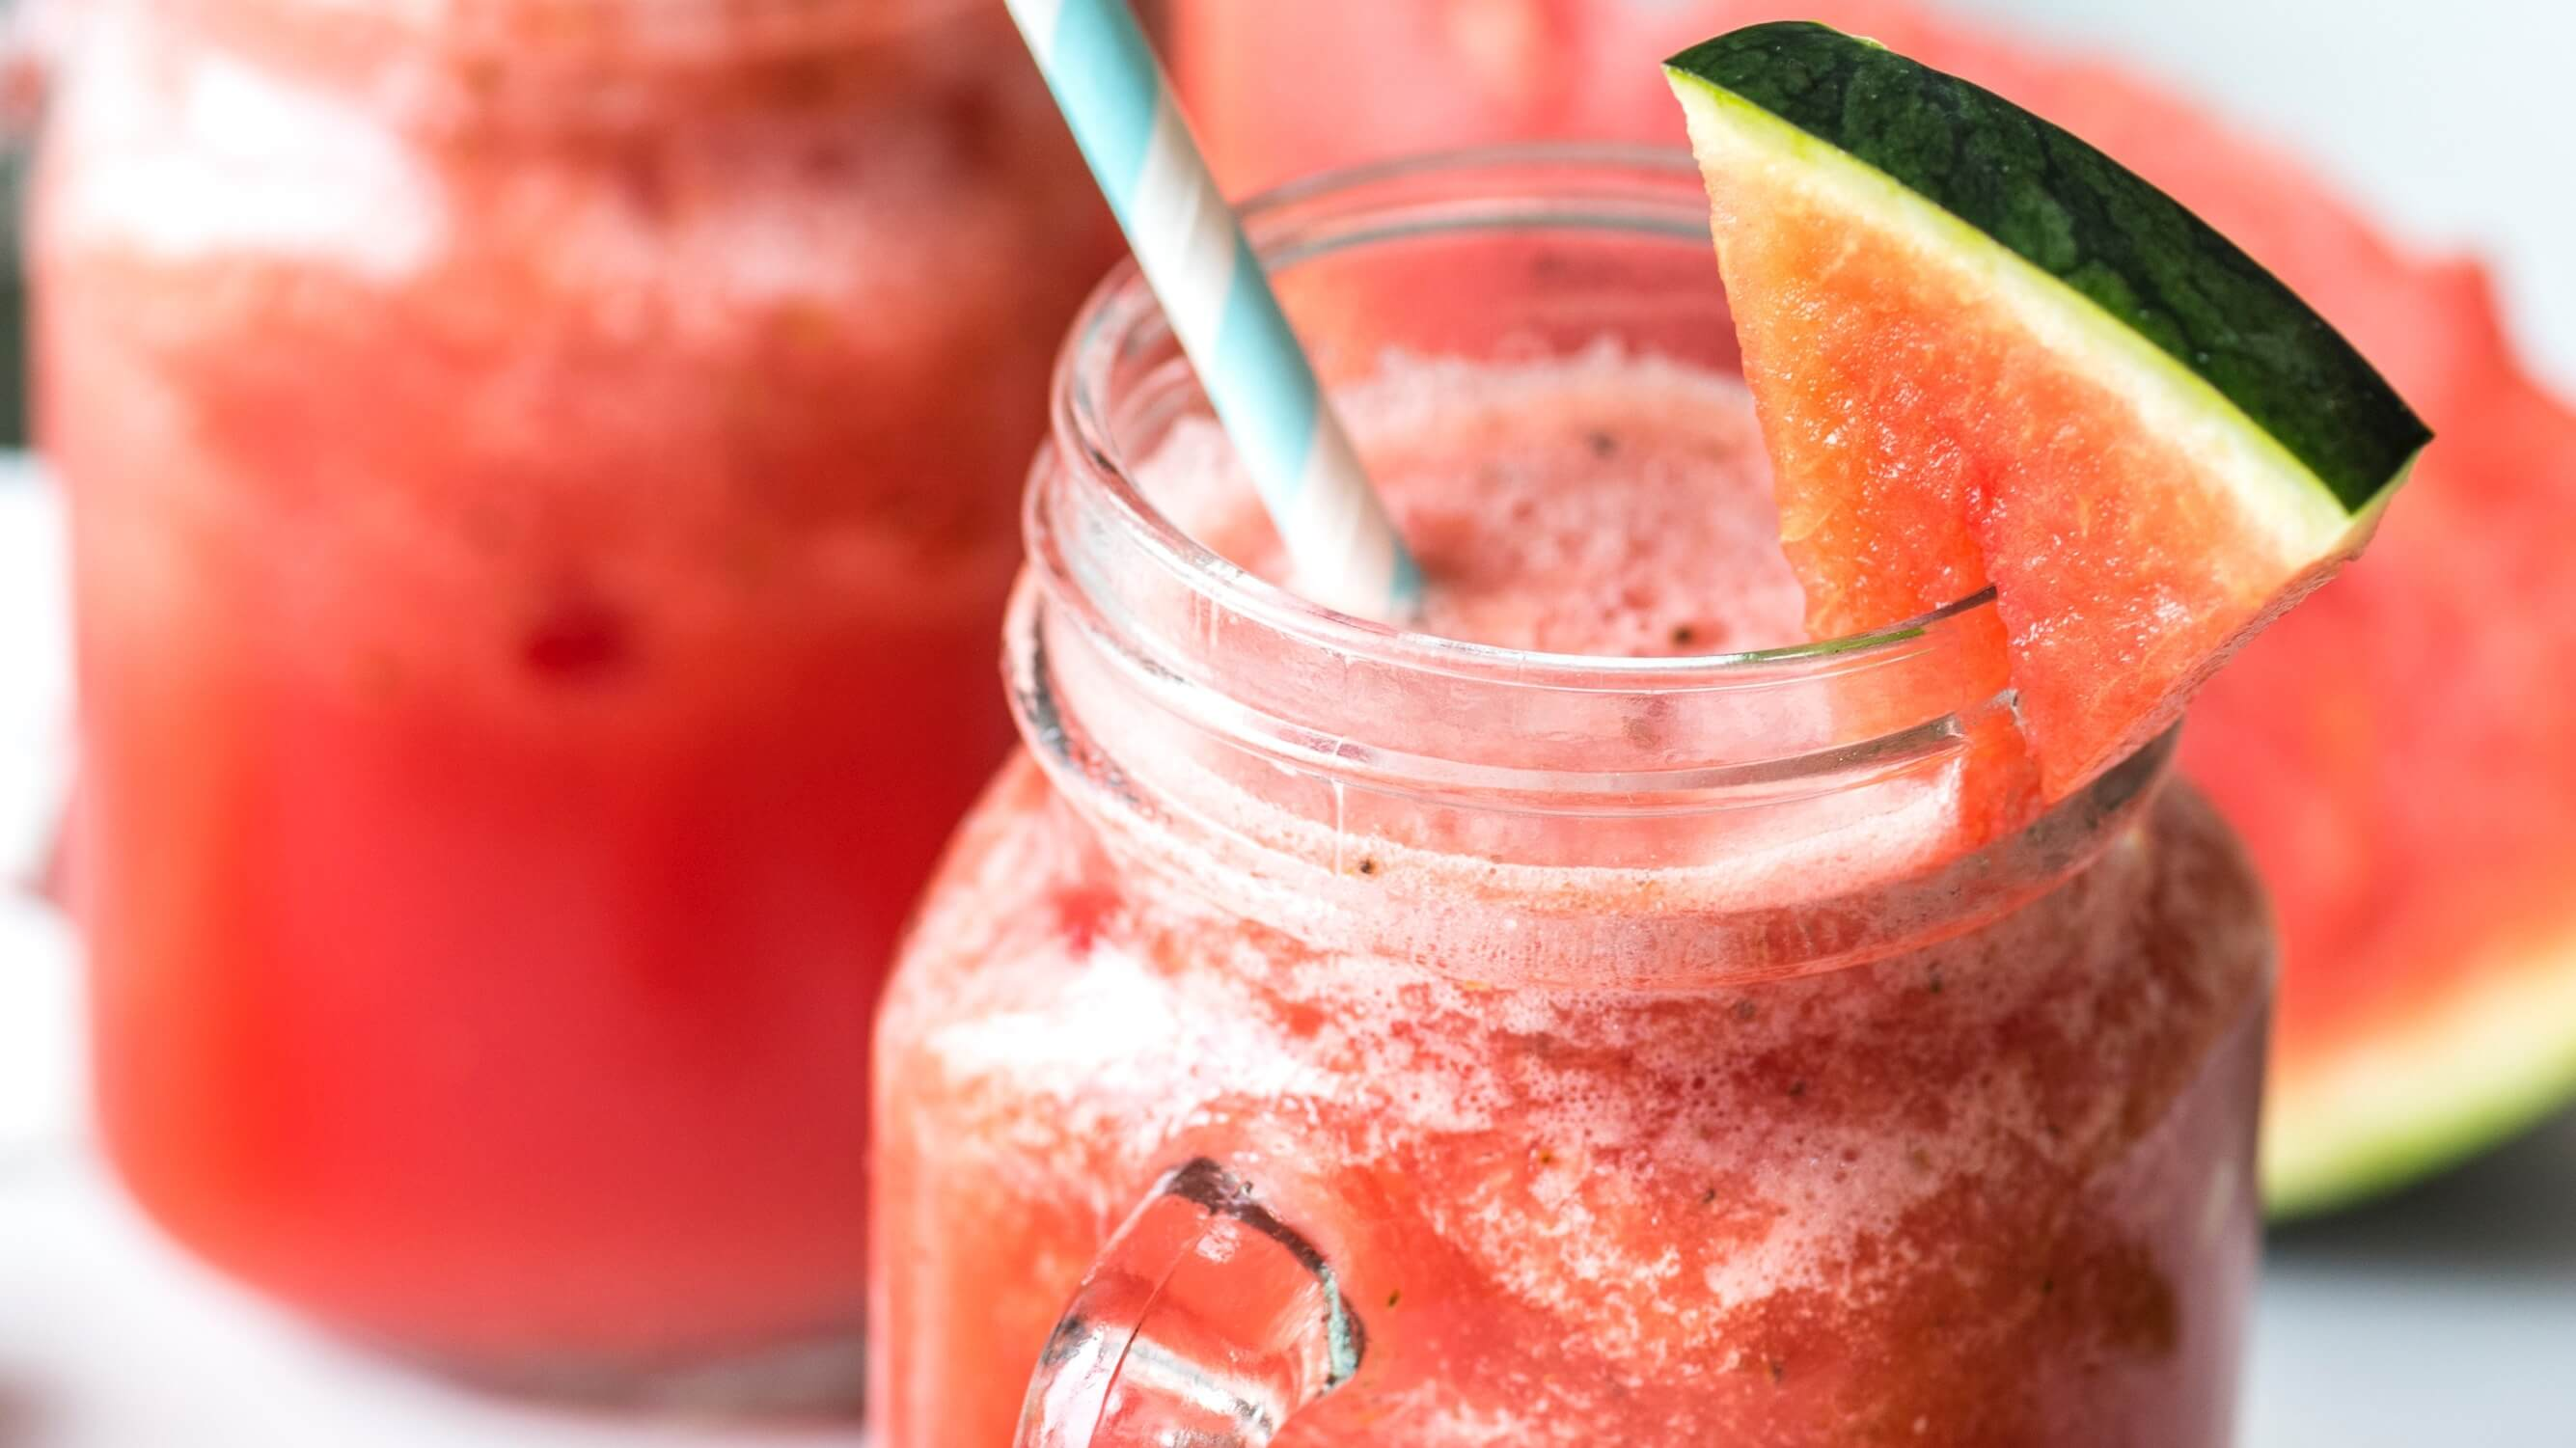 Fully Raw Kristina's 'Secret' Vegan Watermelon Juice Recipe